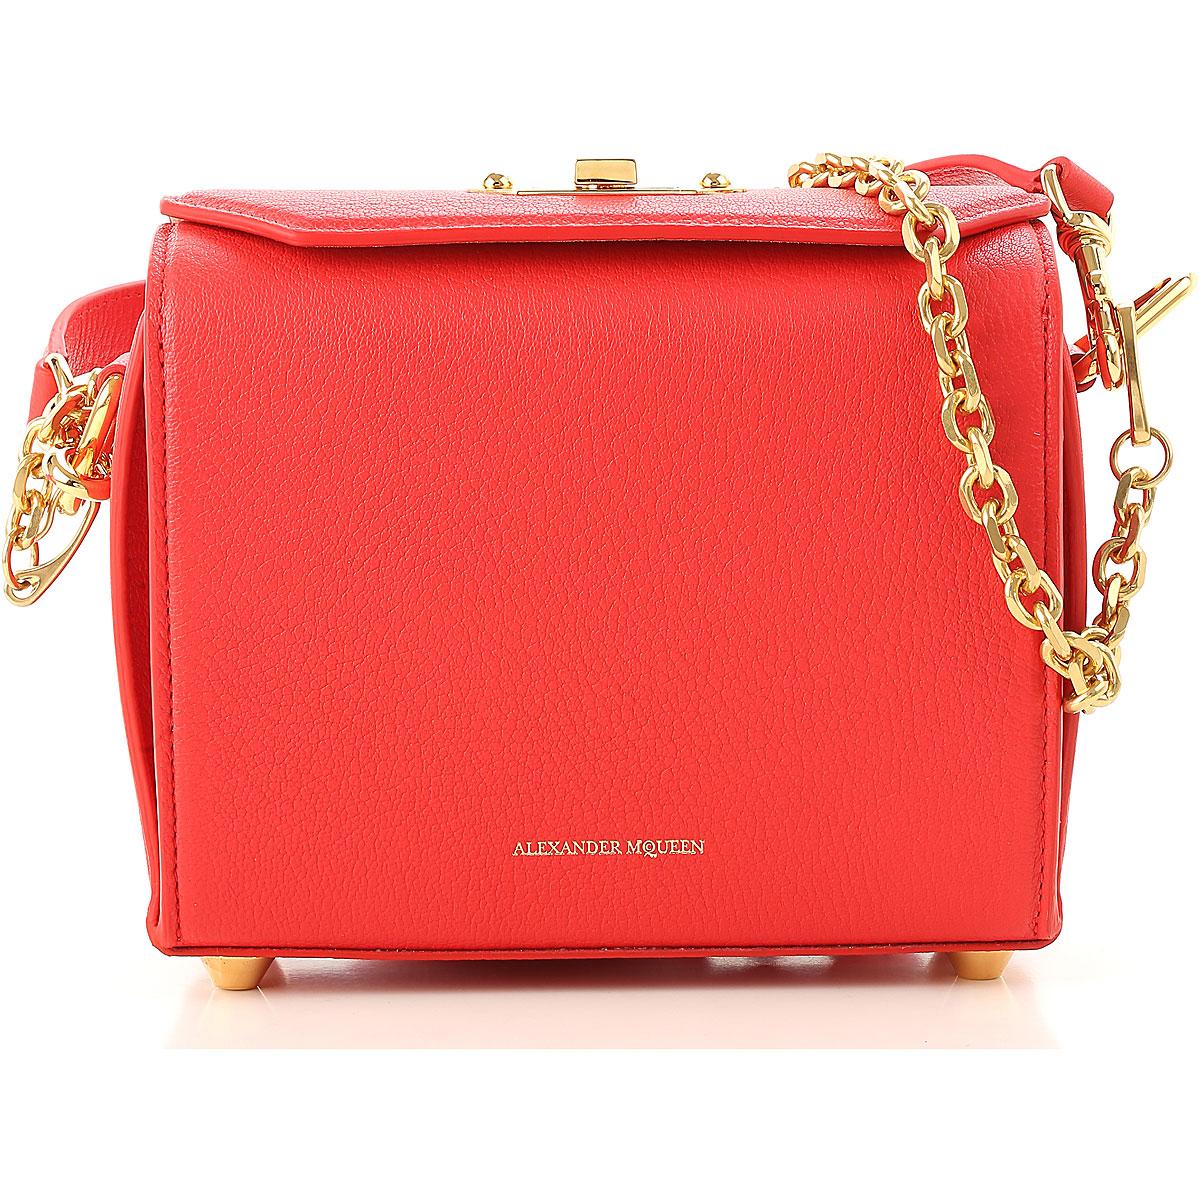 Image of Alexander McQueen Handbags, Red, Leather, 2017